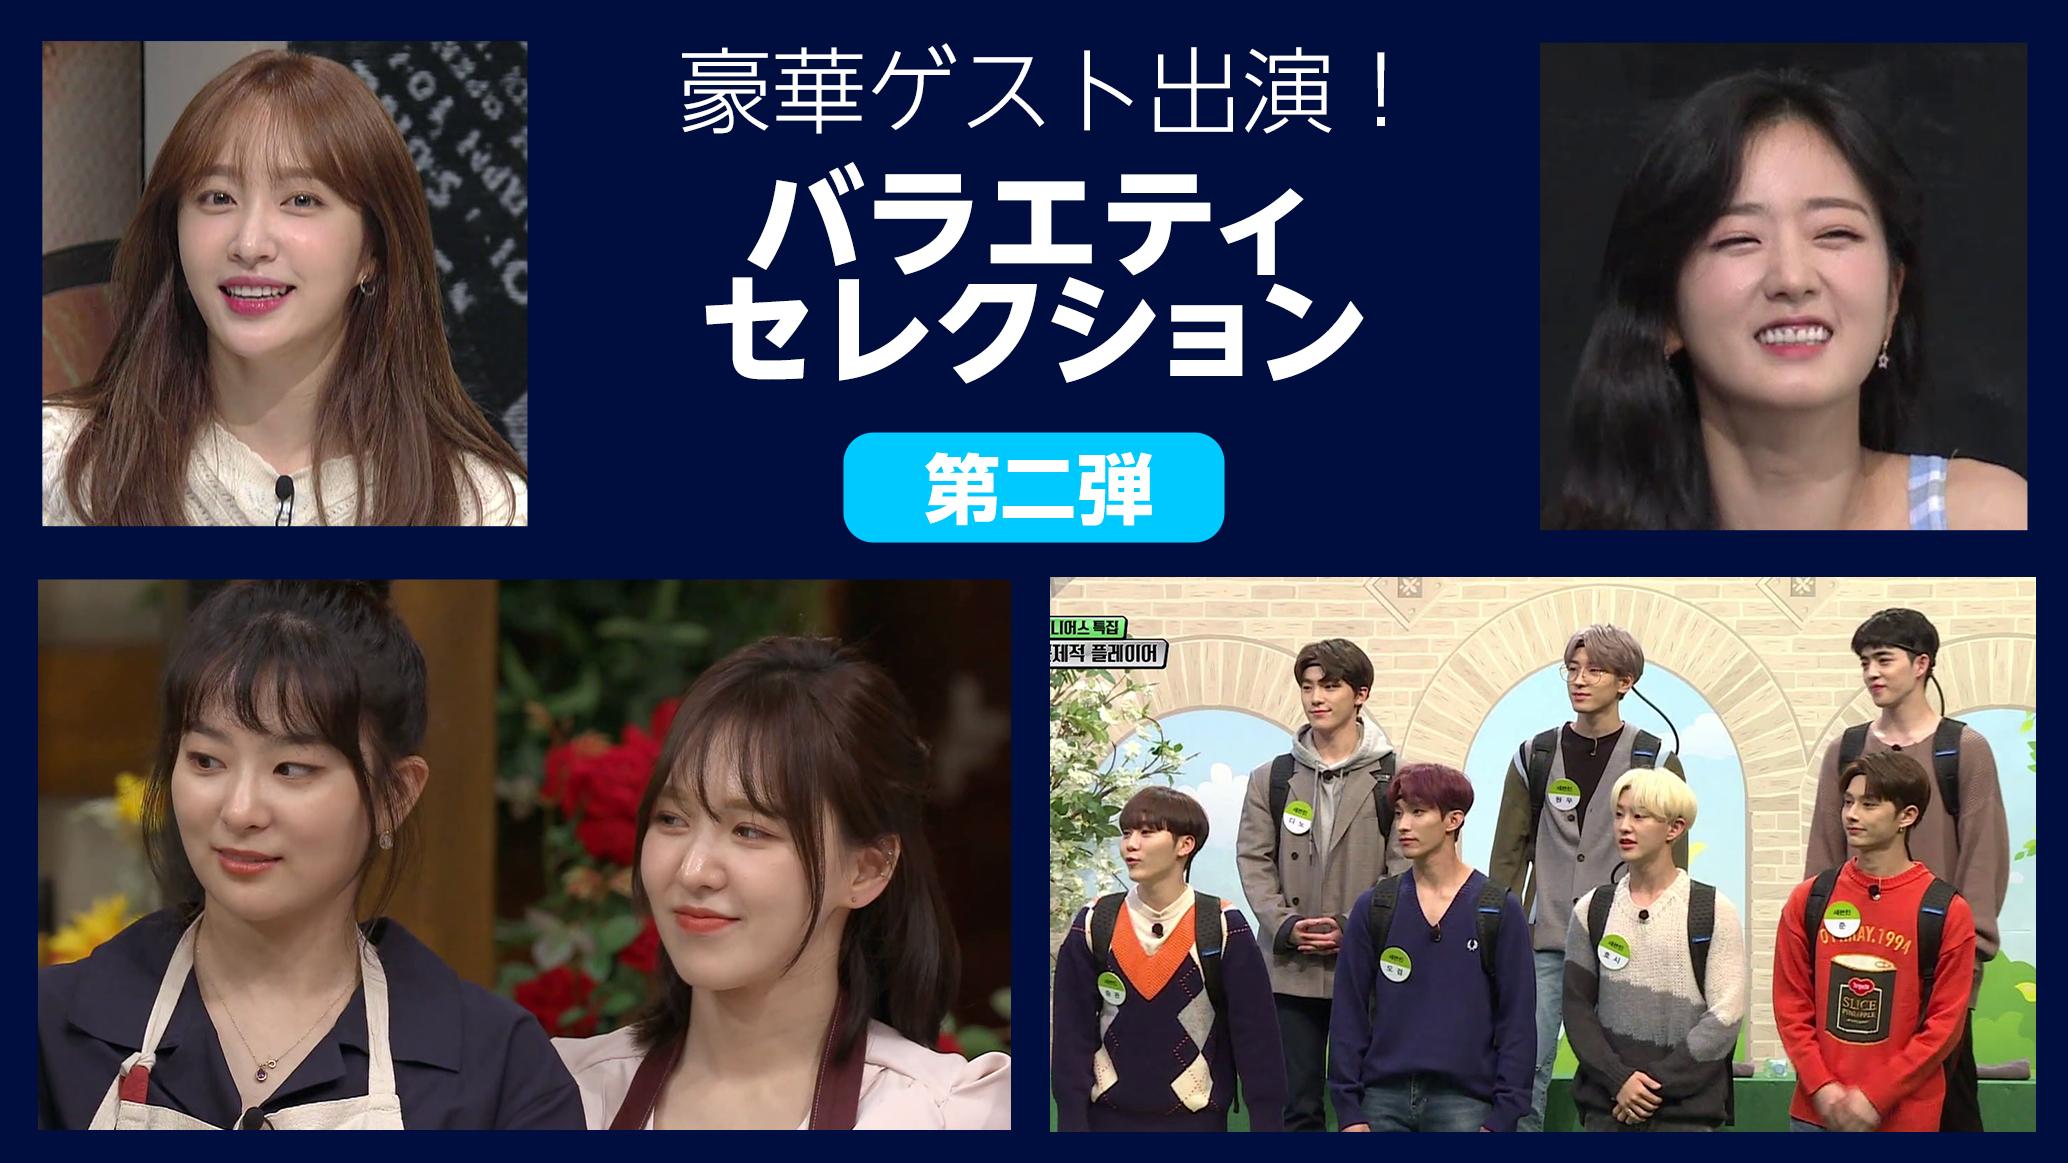 Mnet 4月の特集は豪華ゲスト出演!バラエティセレクション 第二弾SEVENTEEN、スルギ&ウェンディ(Red Velvet)ら出演番組をお届け!